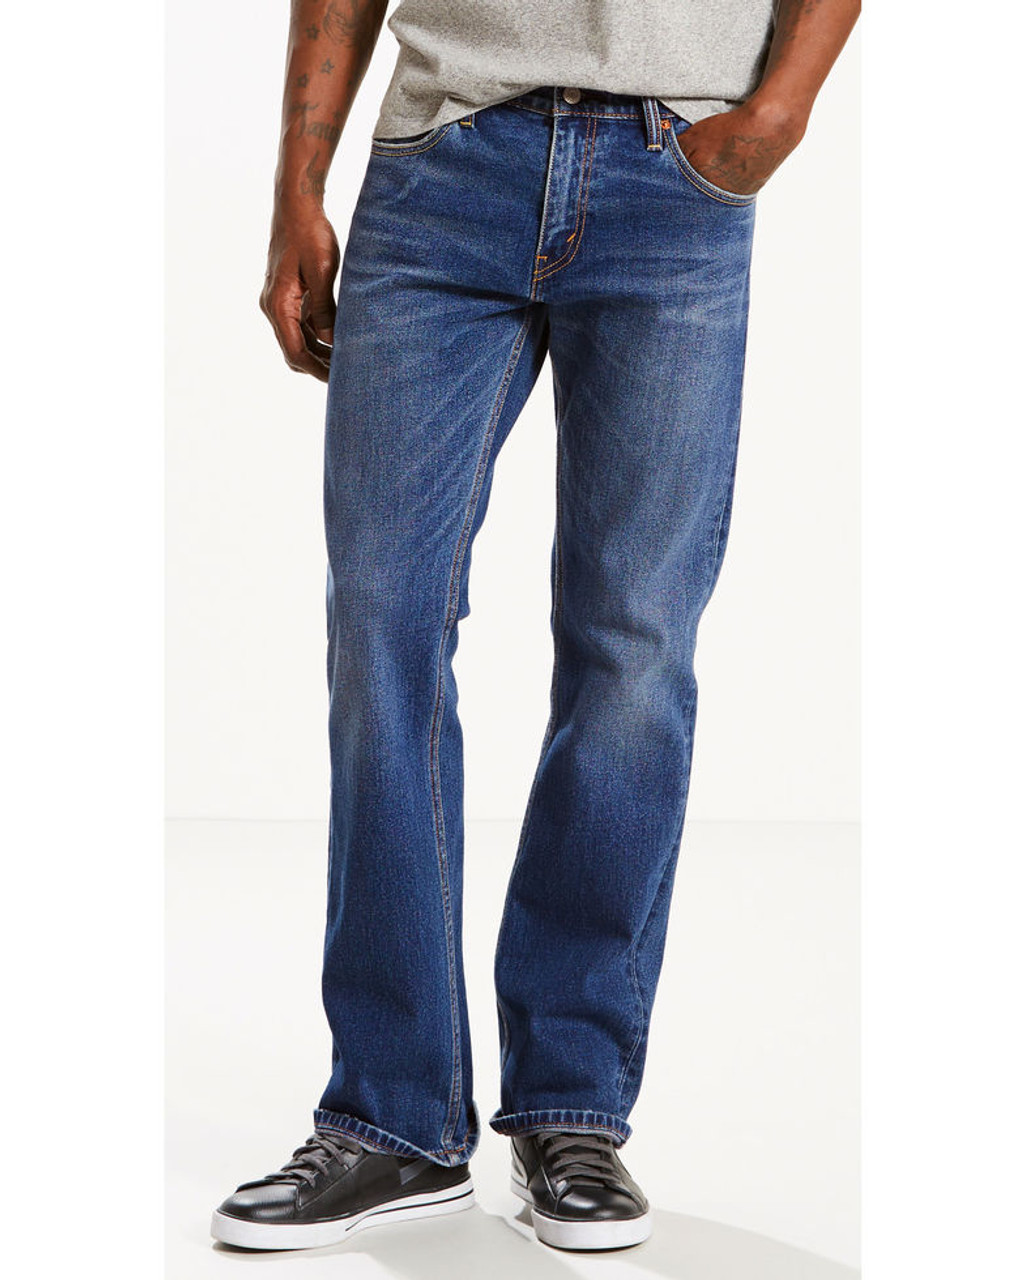 c898c6cb897 527-0489 Slim Fit Stonewash Boot Cut Stretch Jeans